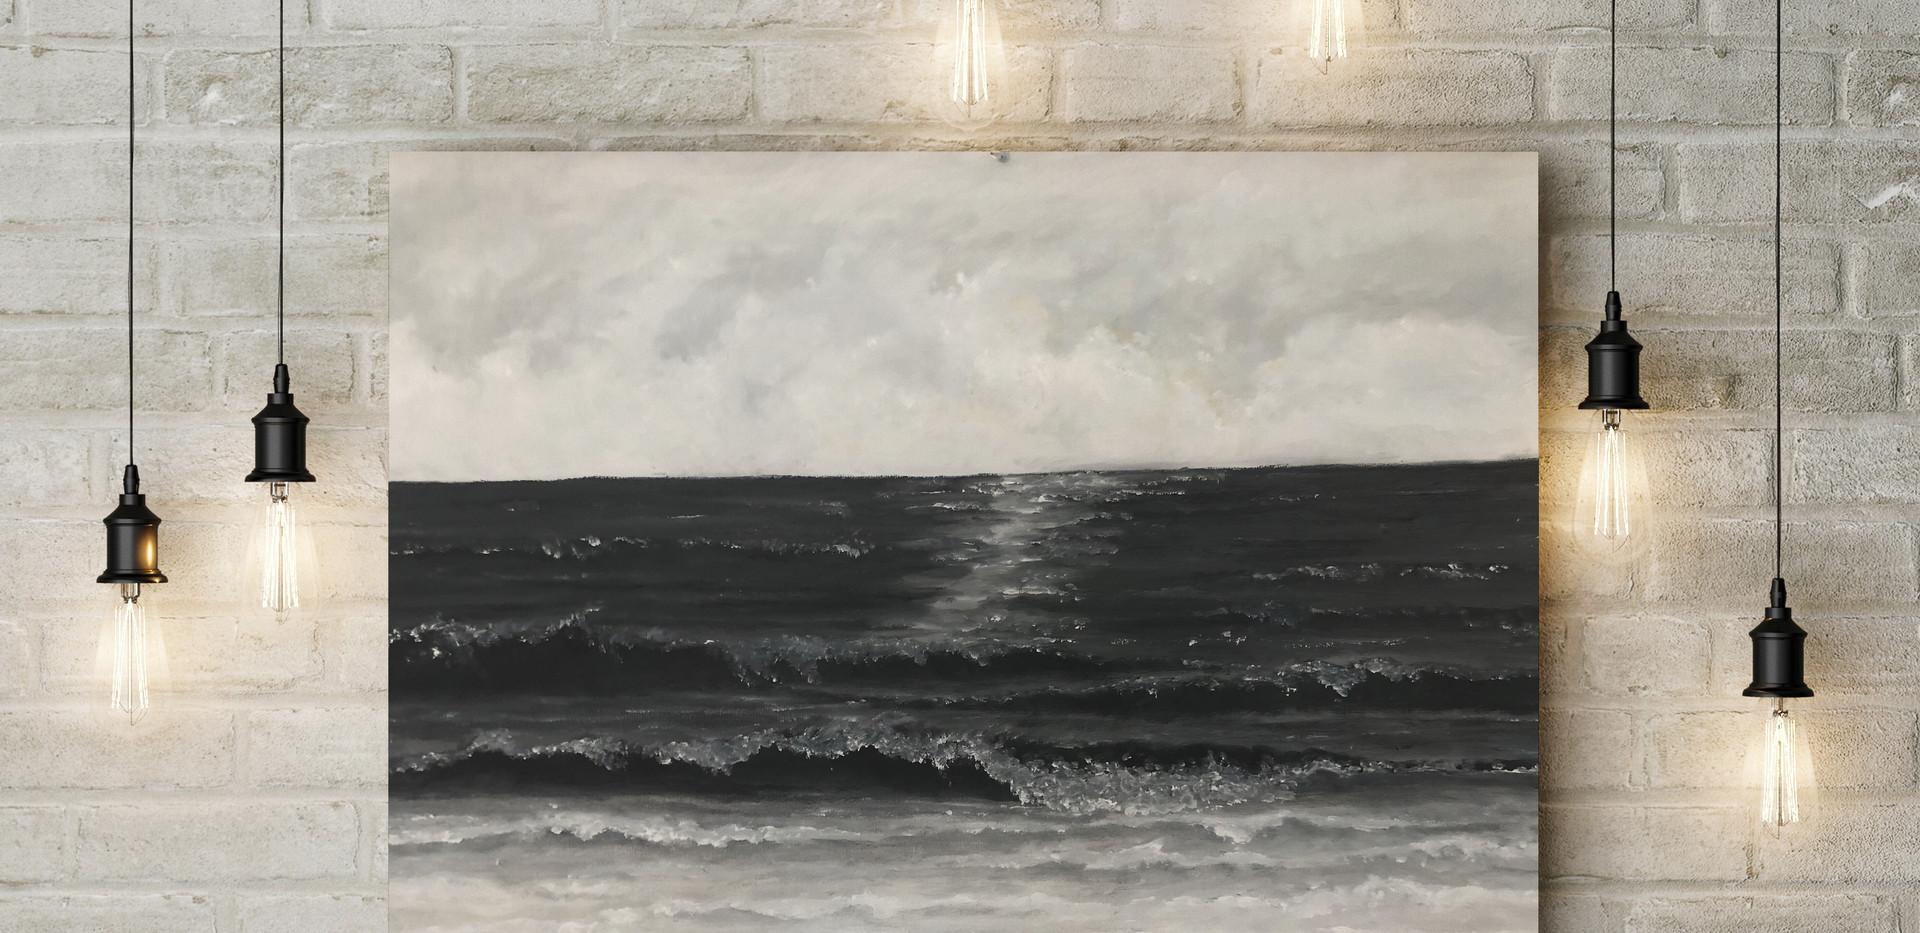 Brillo de mar       Sea brightness